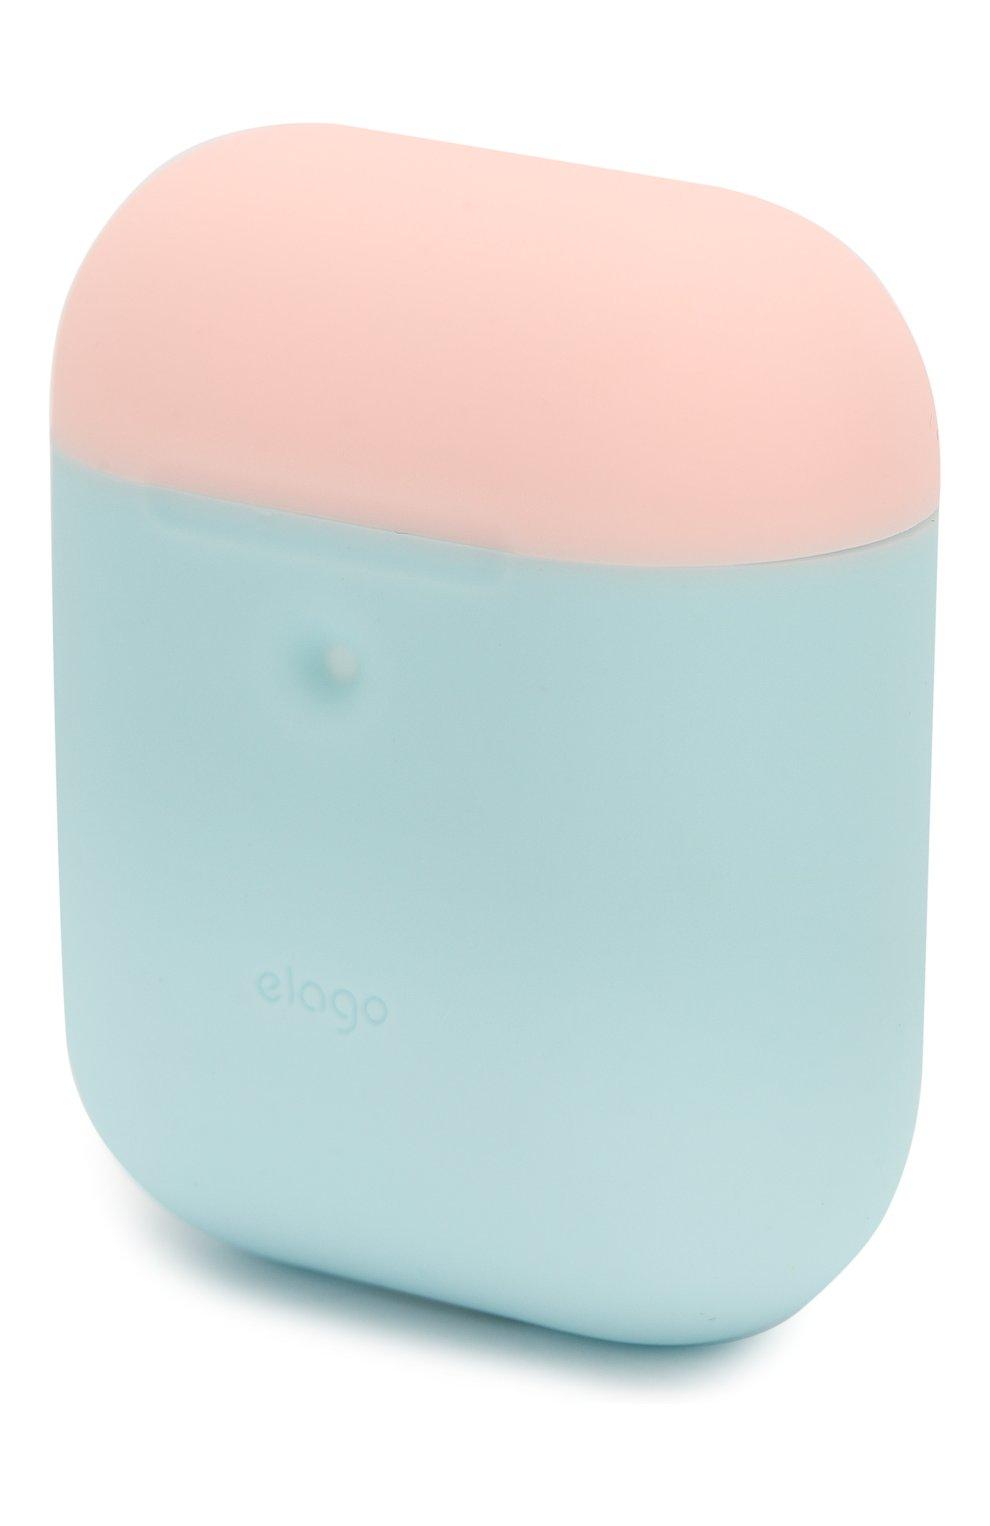 Чехол для airpods wireless ELAGO голубого цвета, арт. EAP2DO-PBL-PKWH | Фото 8 (Статус проверки: Проверена категория)